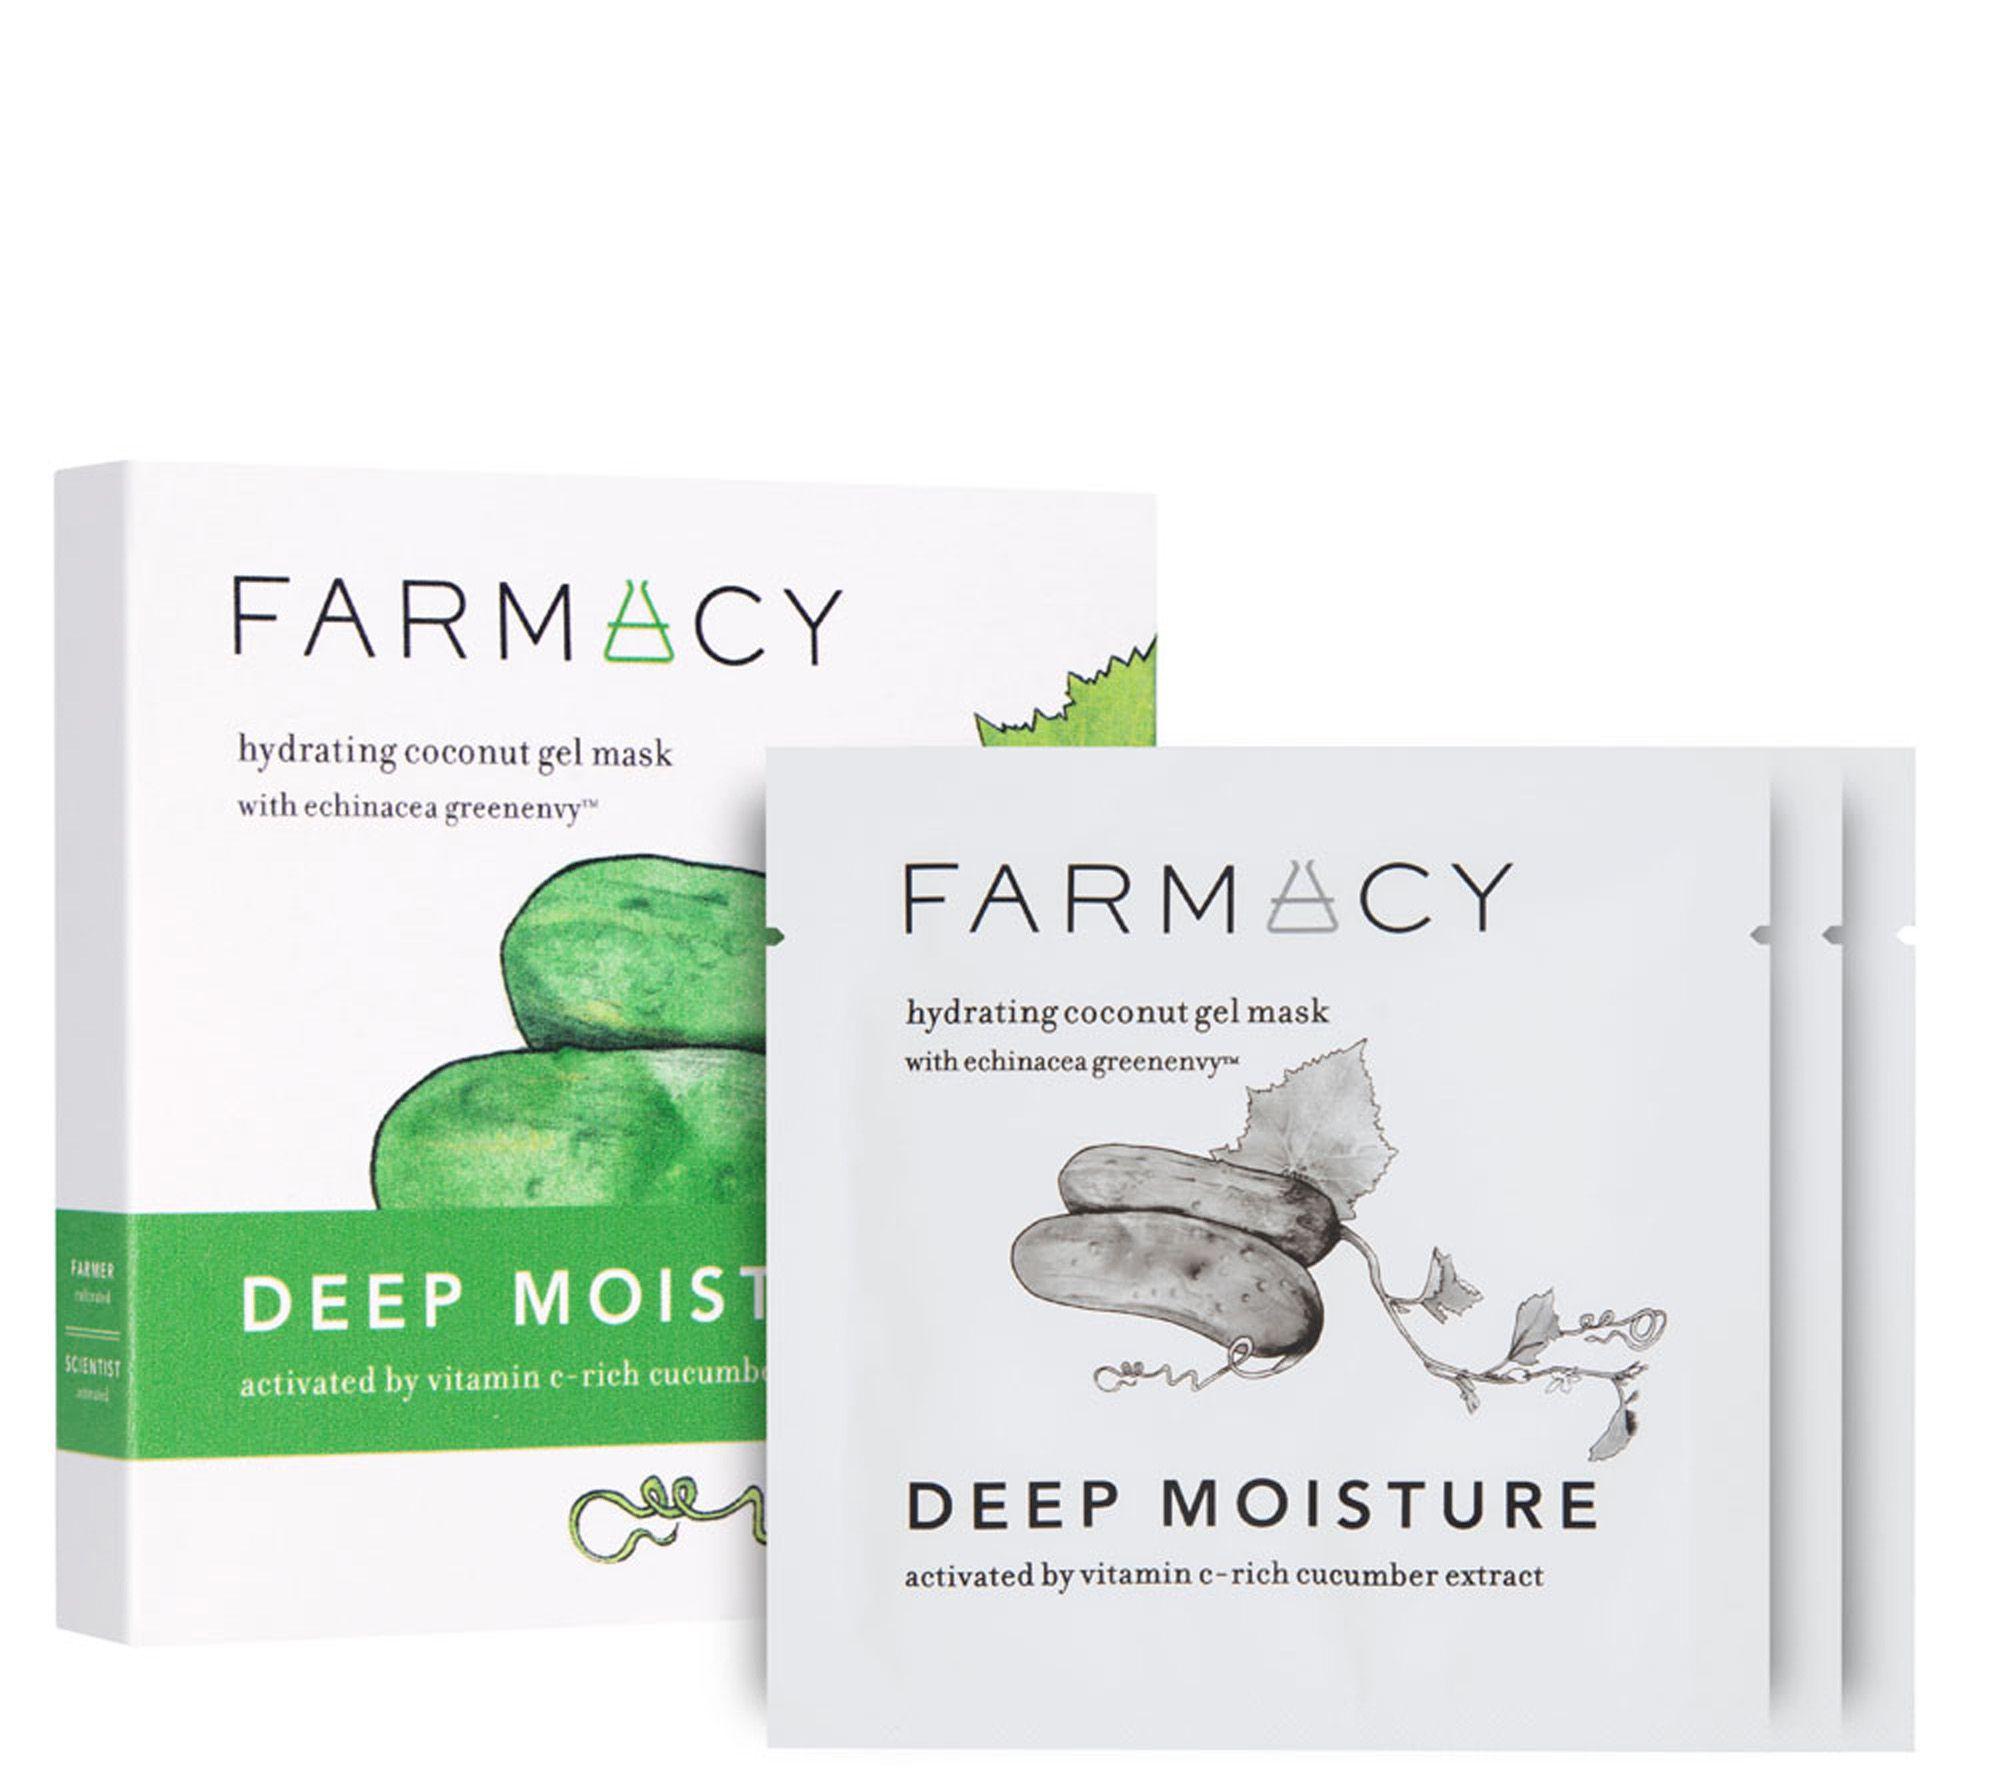 New customer qvc promo code - Farmacy Deep Moisture Hydrating Coconut Gel Mask A340129